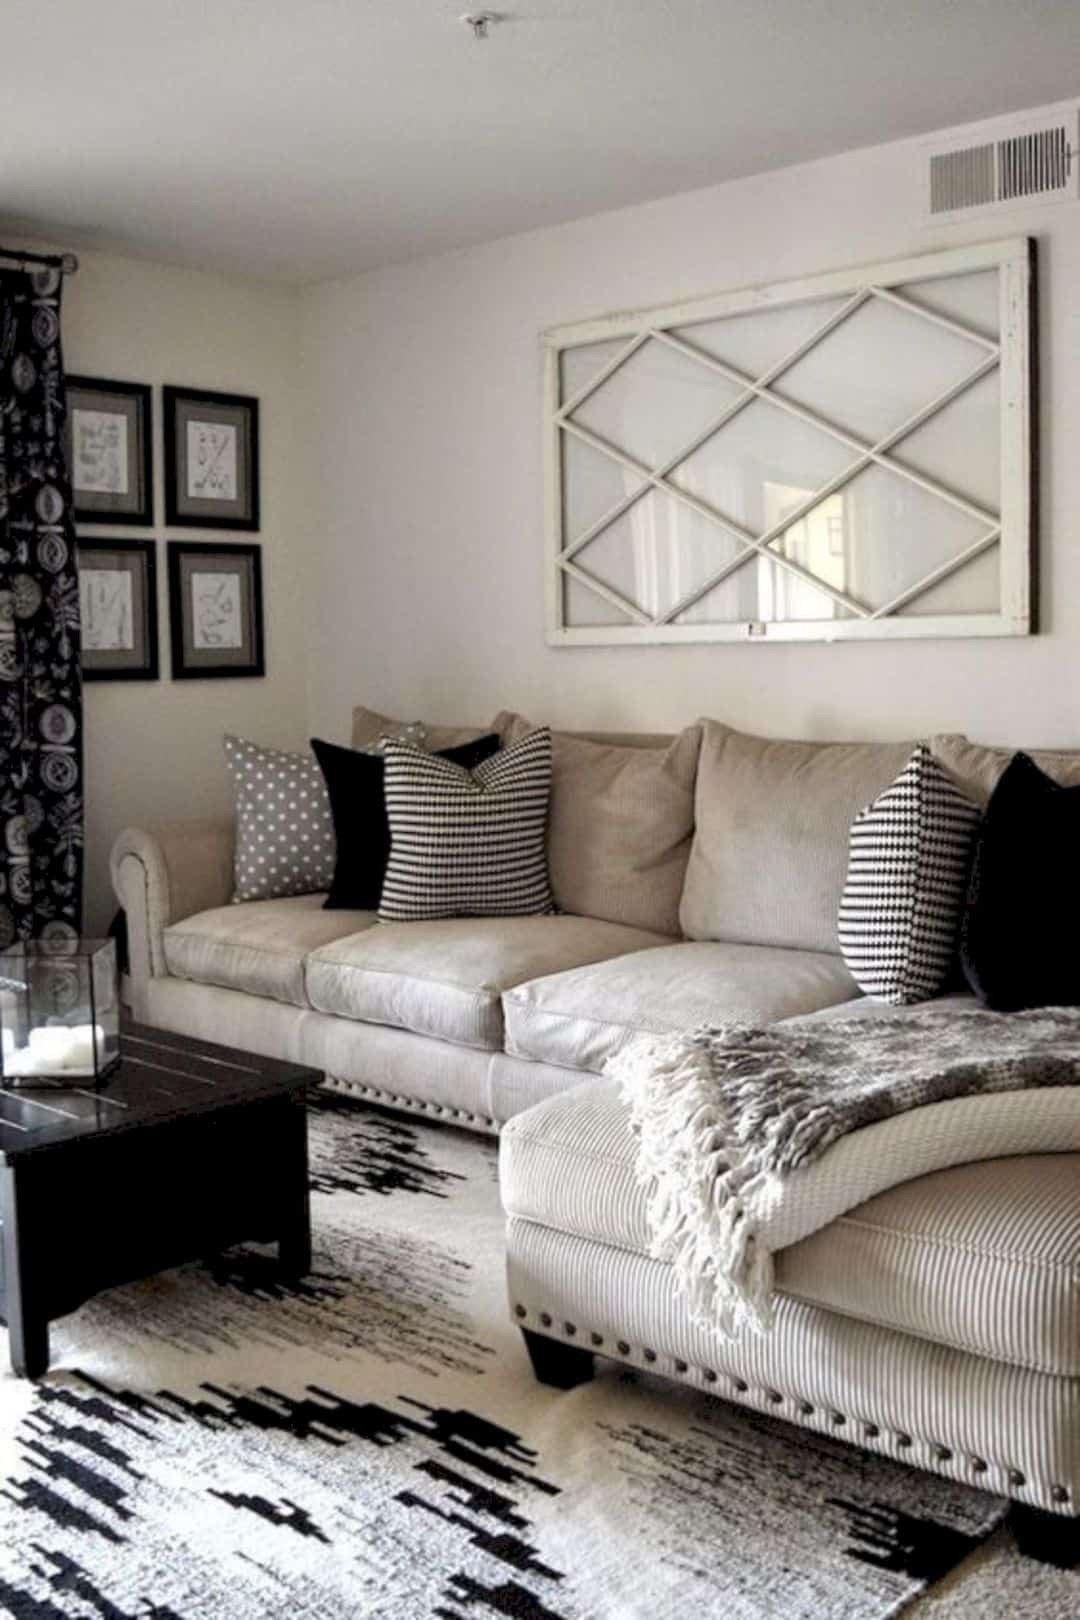 Wall Decor for Living Room 16 Magnificent Living Room Walls Decorating Ideas